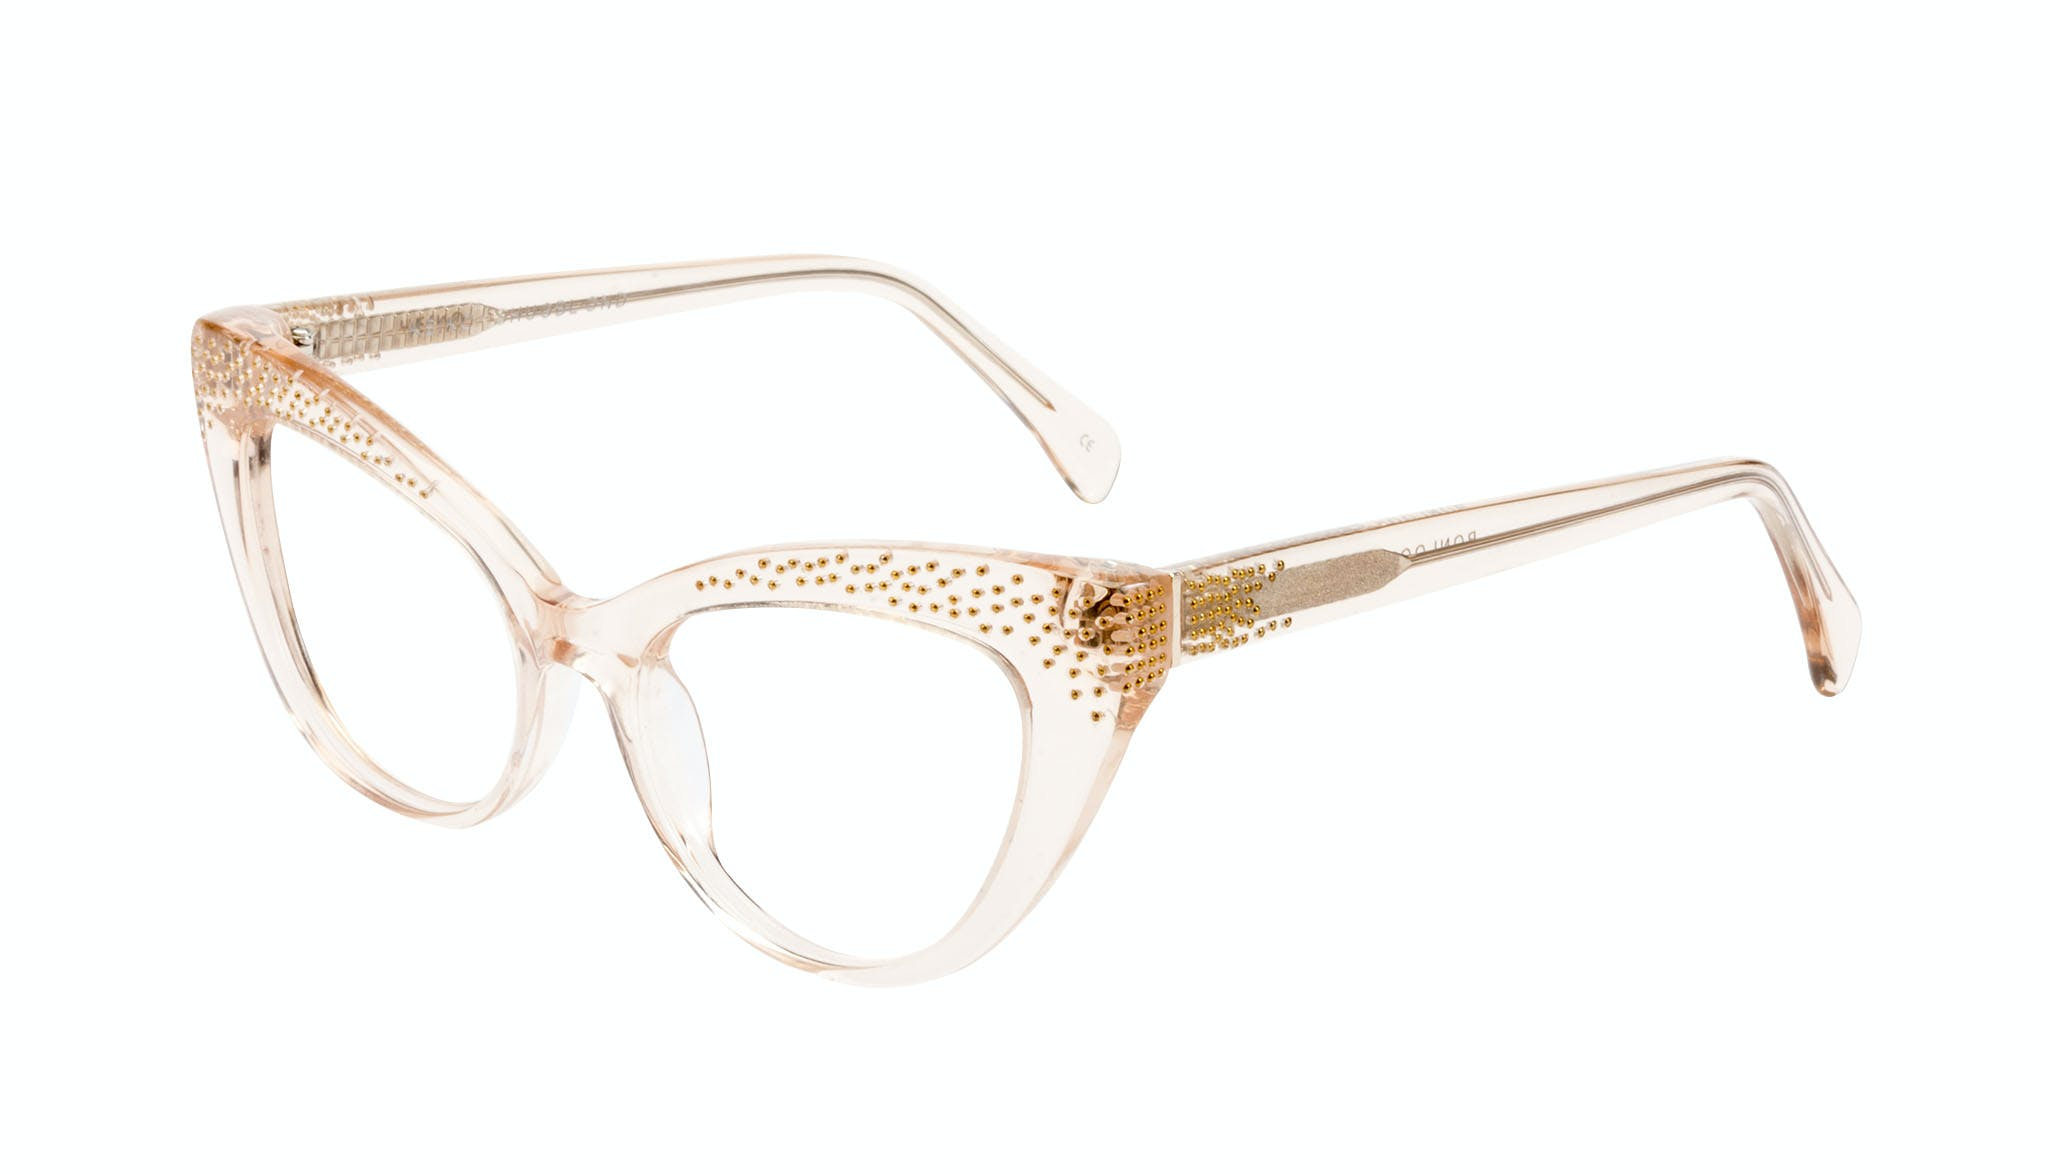 Affordable Fashion Glasses Cat Eye Daring Cateye Eyeglasses Women Keiko Shug Blond Tilt